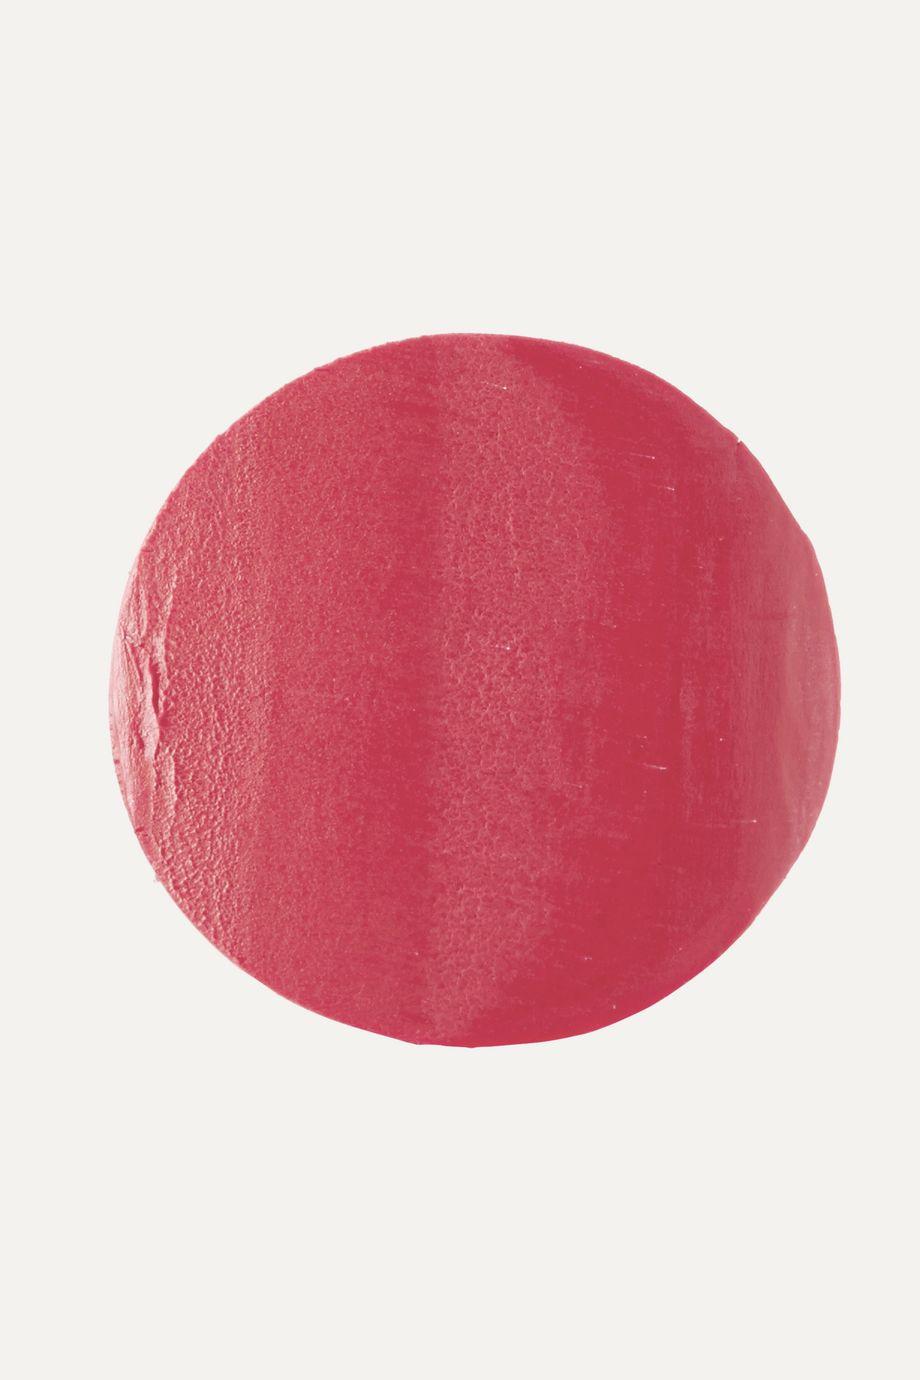 Illamasqua Matte Lipstick - Climax